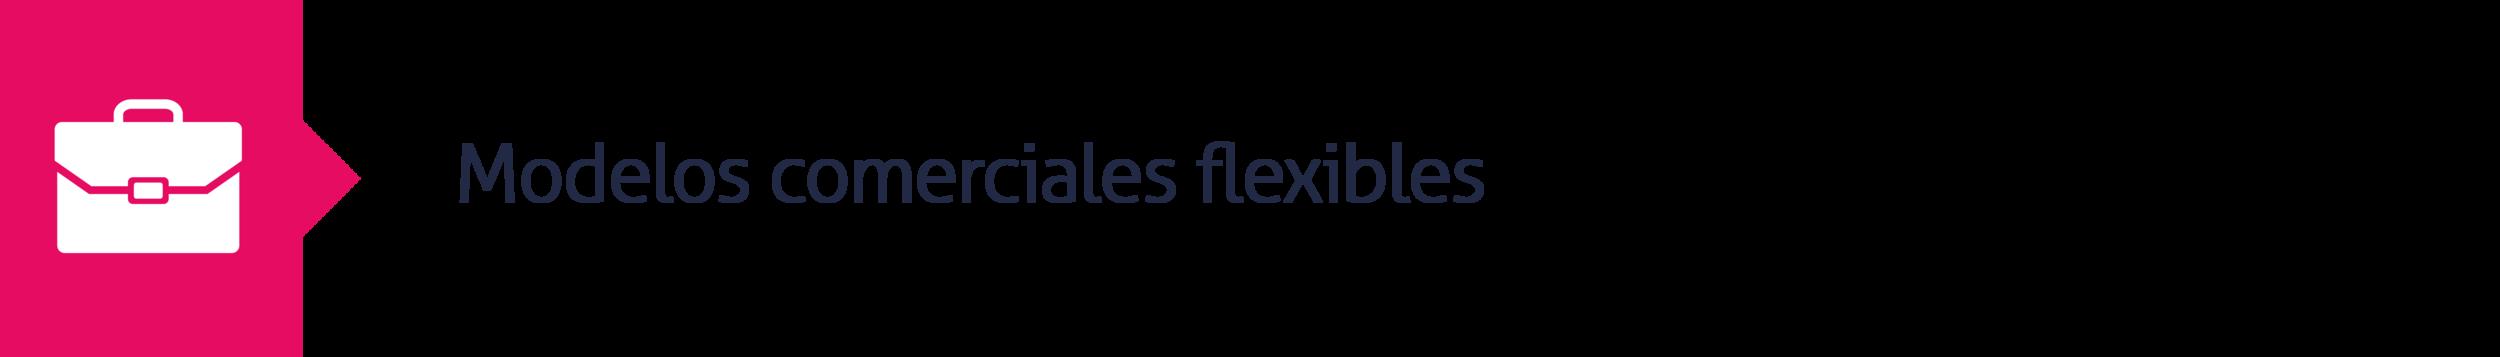 10.Modelos comerciales flexibles